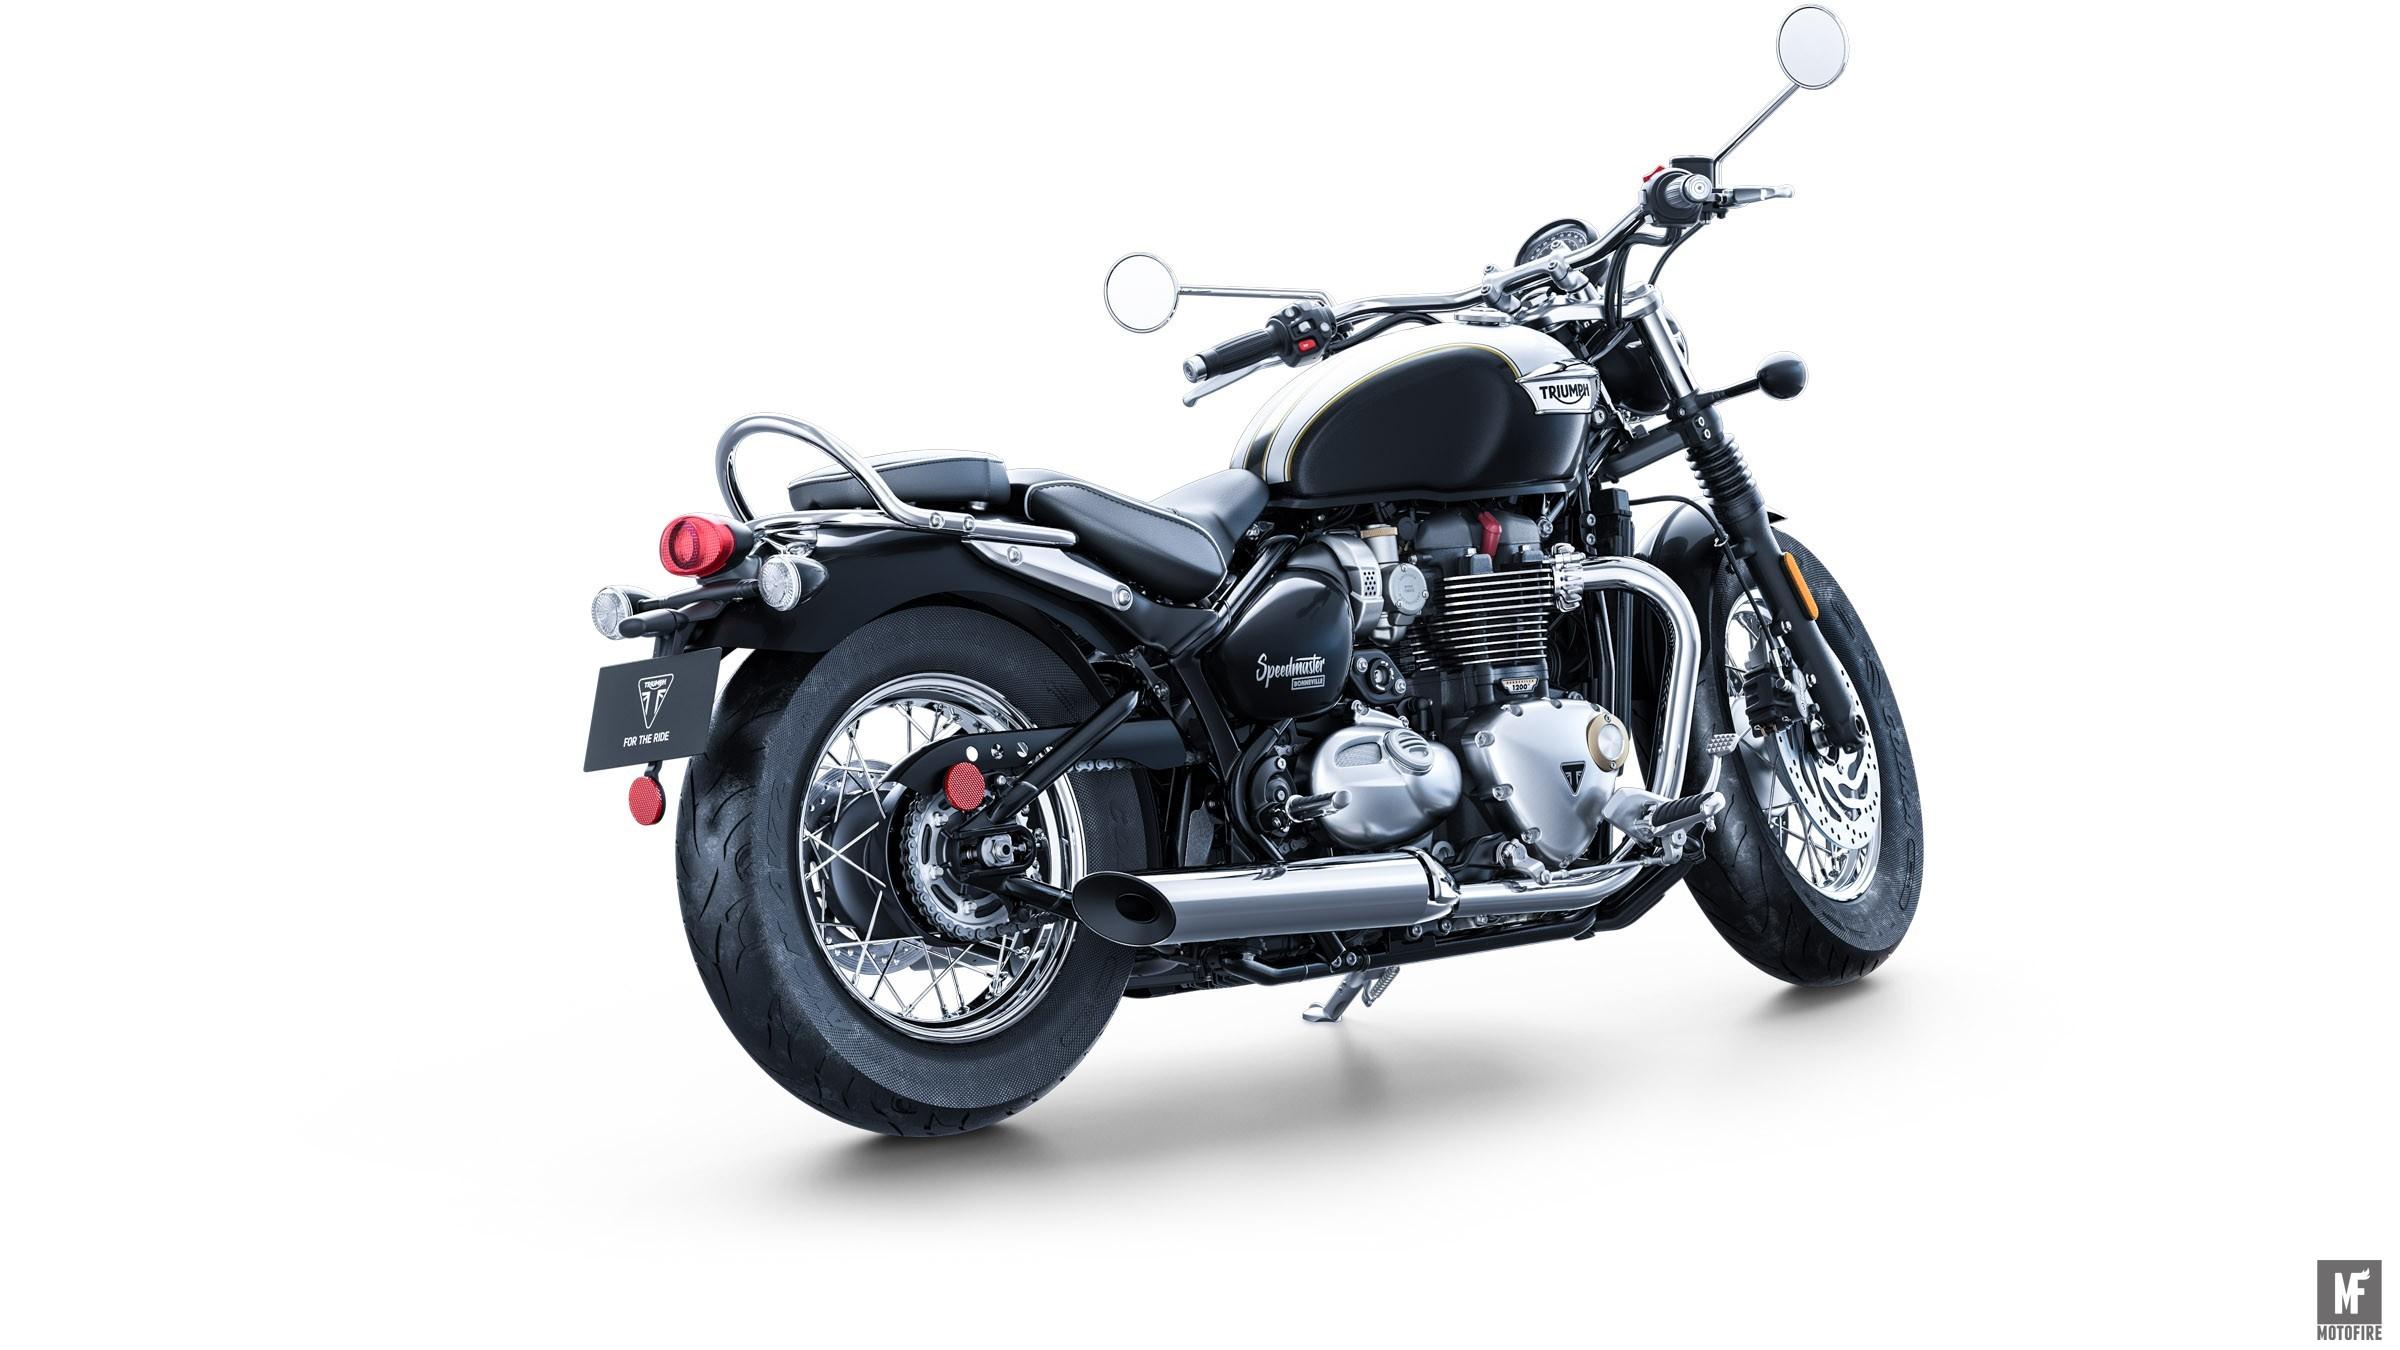 motofire-Speedmaster_Rear_3-4_Fusion_White_Phantom_Black.jpg